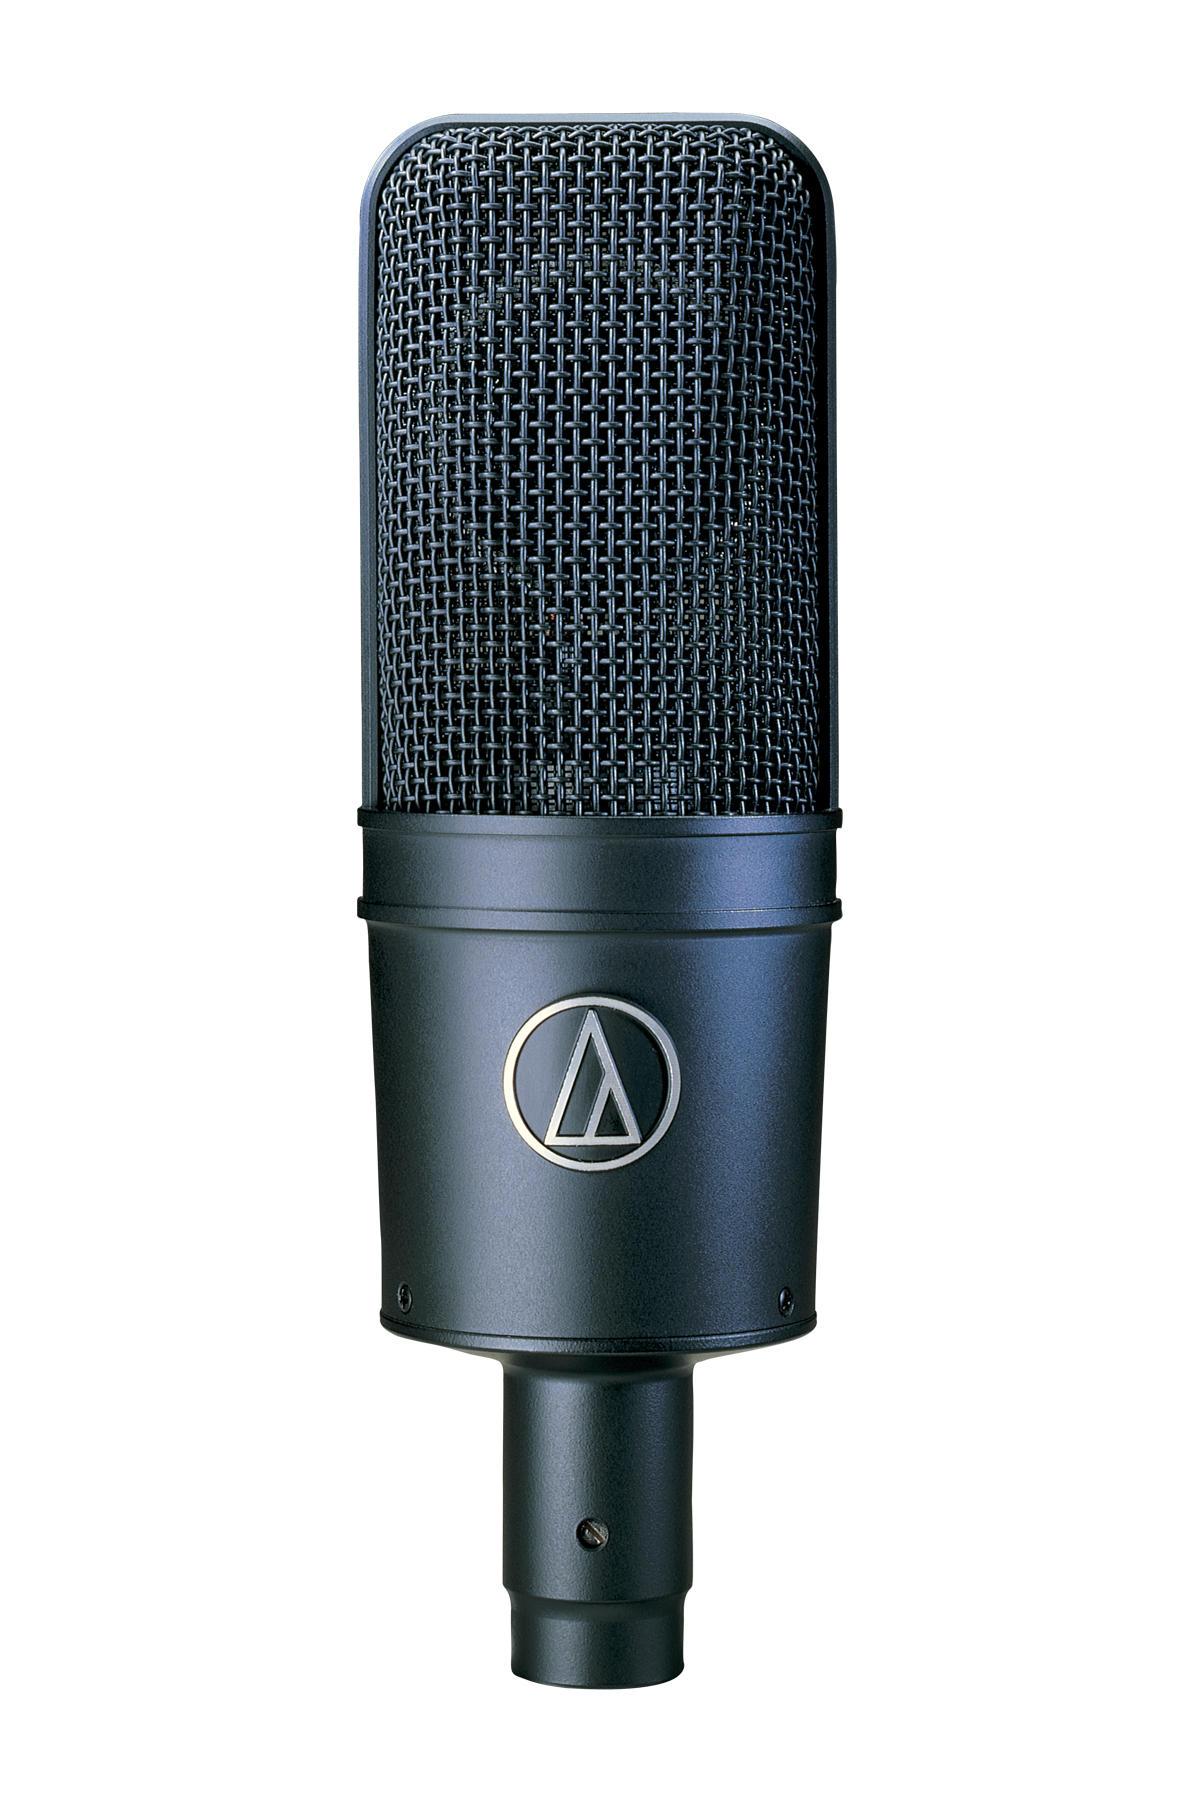 audio technica at4033 large diaphragm condenser microphone. Black Bedroom Furniture Sets. Home Design Ideas